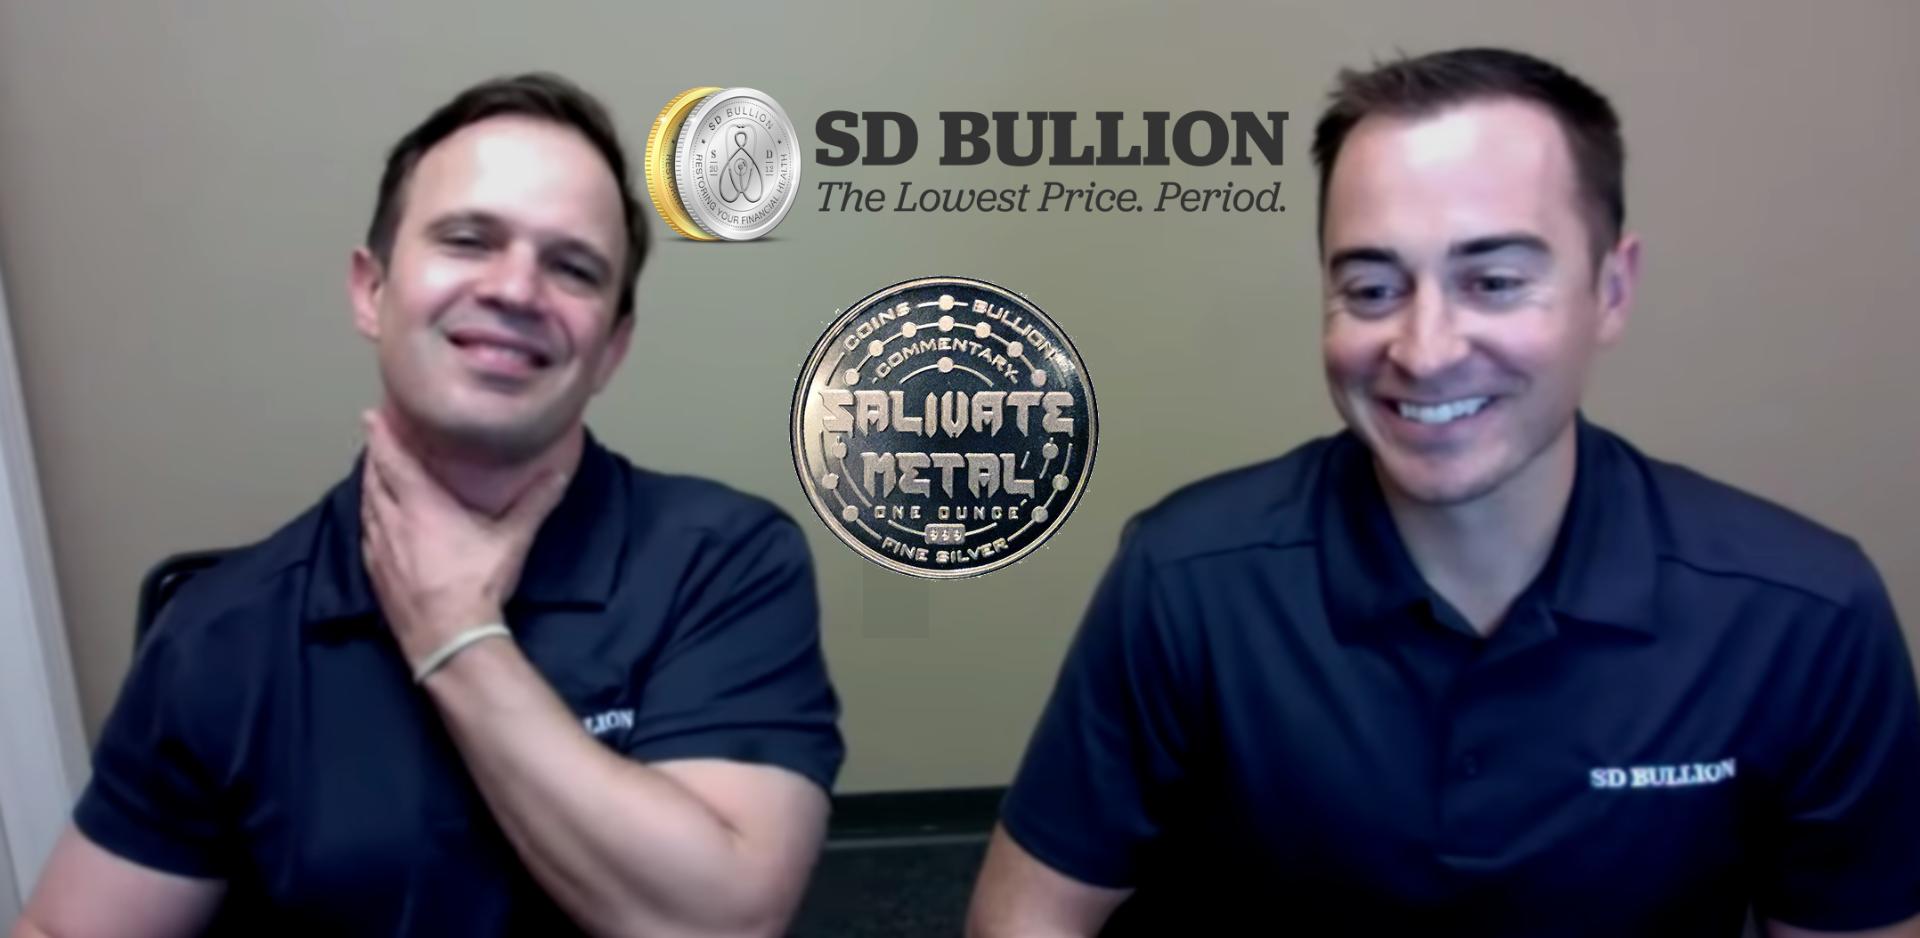 SDBullion CEO Tyler Wall Rare Interview Inside the Precious Metals Industry @JamesHenryAnd